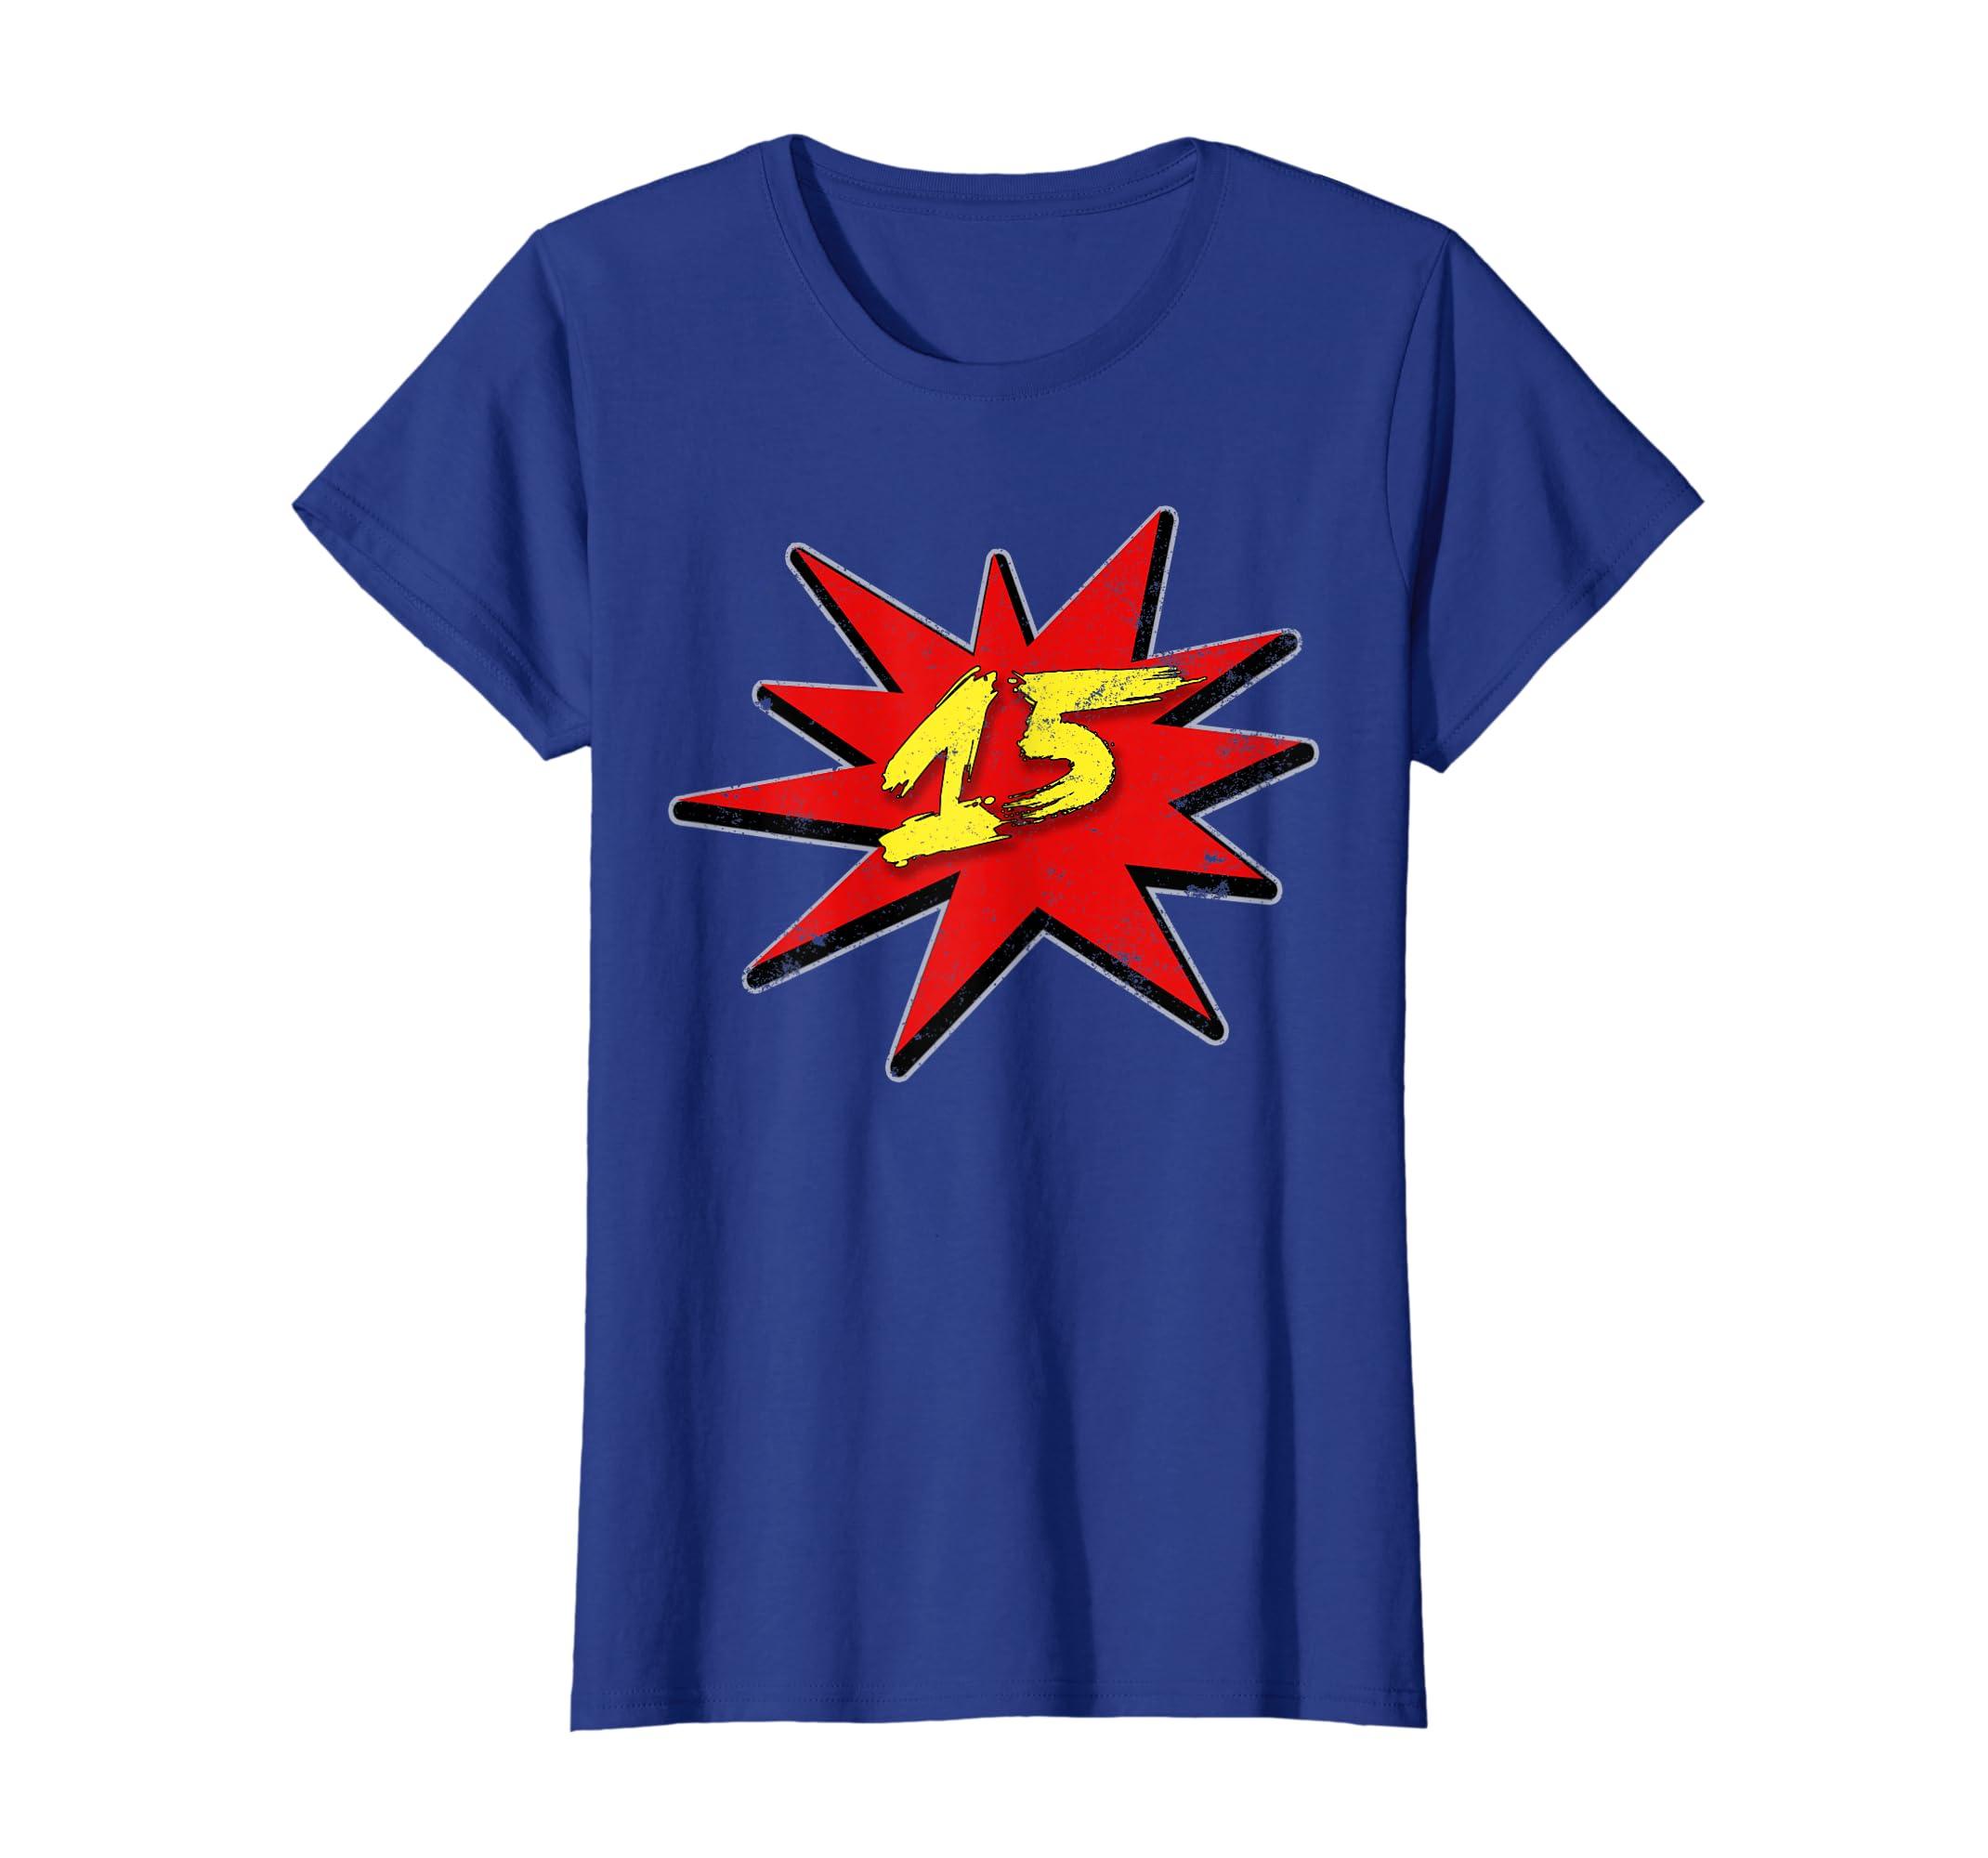 Amazon 15 Year Old Birthday Gift For Boy Girl Clothing